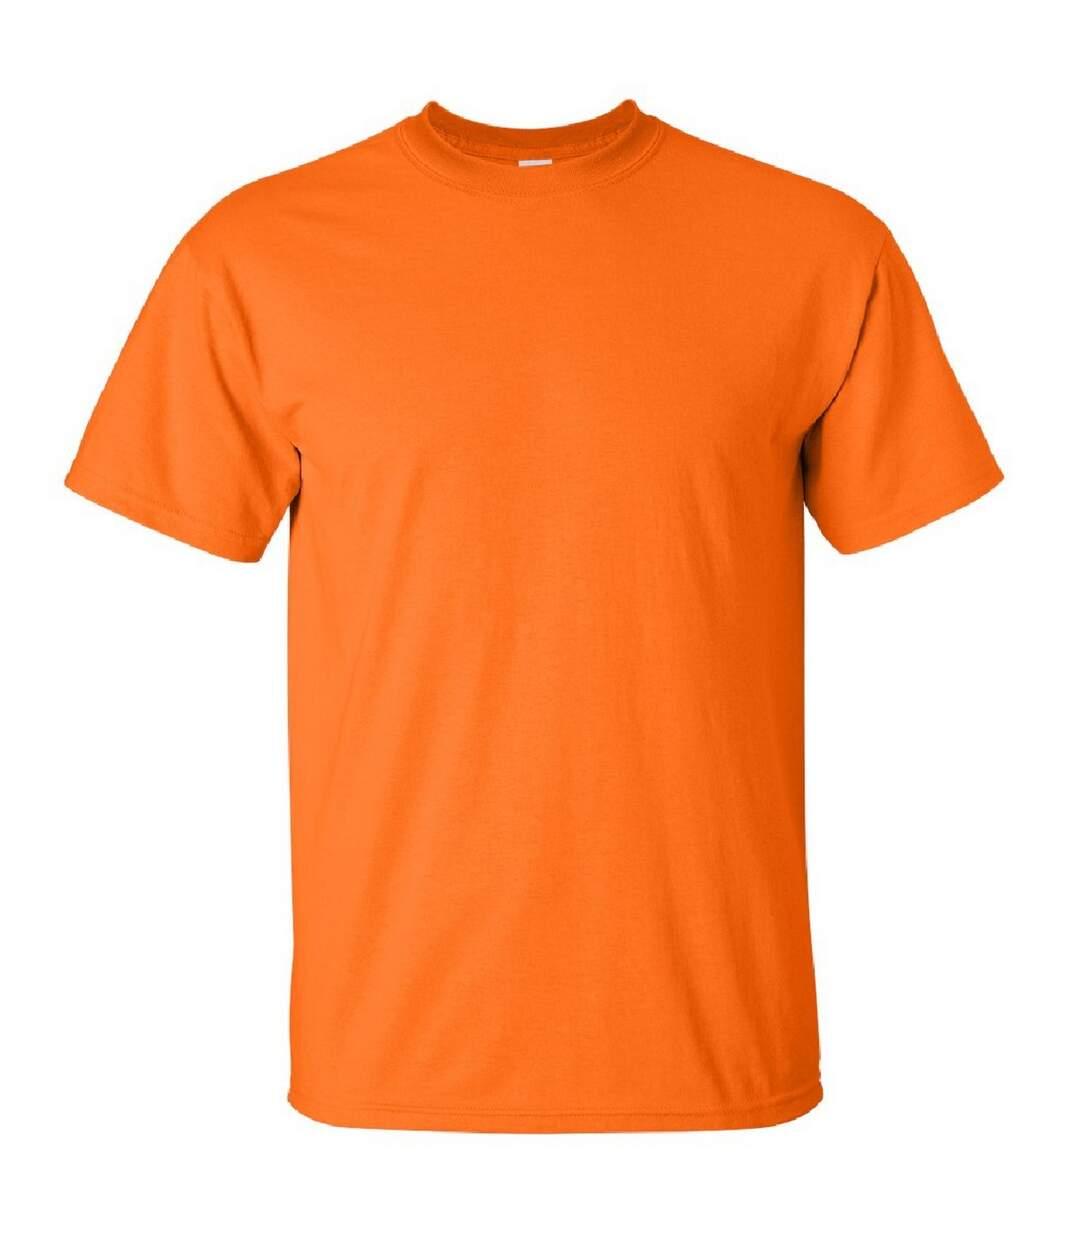 Gildan Mens Ultra Cotton Short Sleeve T-Shirt (Safety Orange) - UTBC475